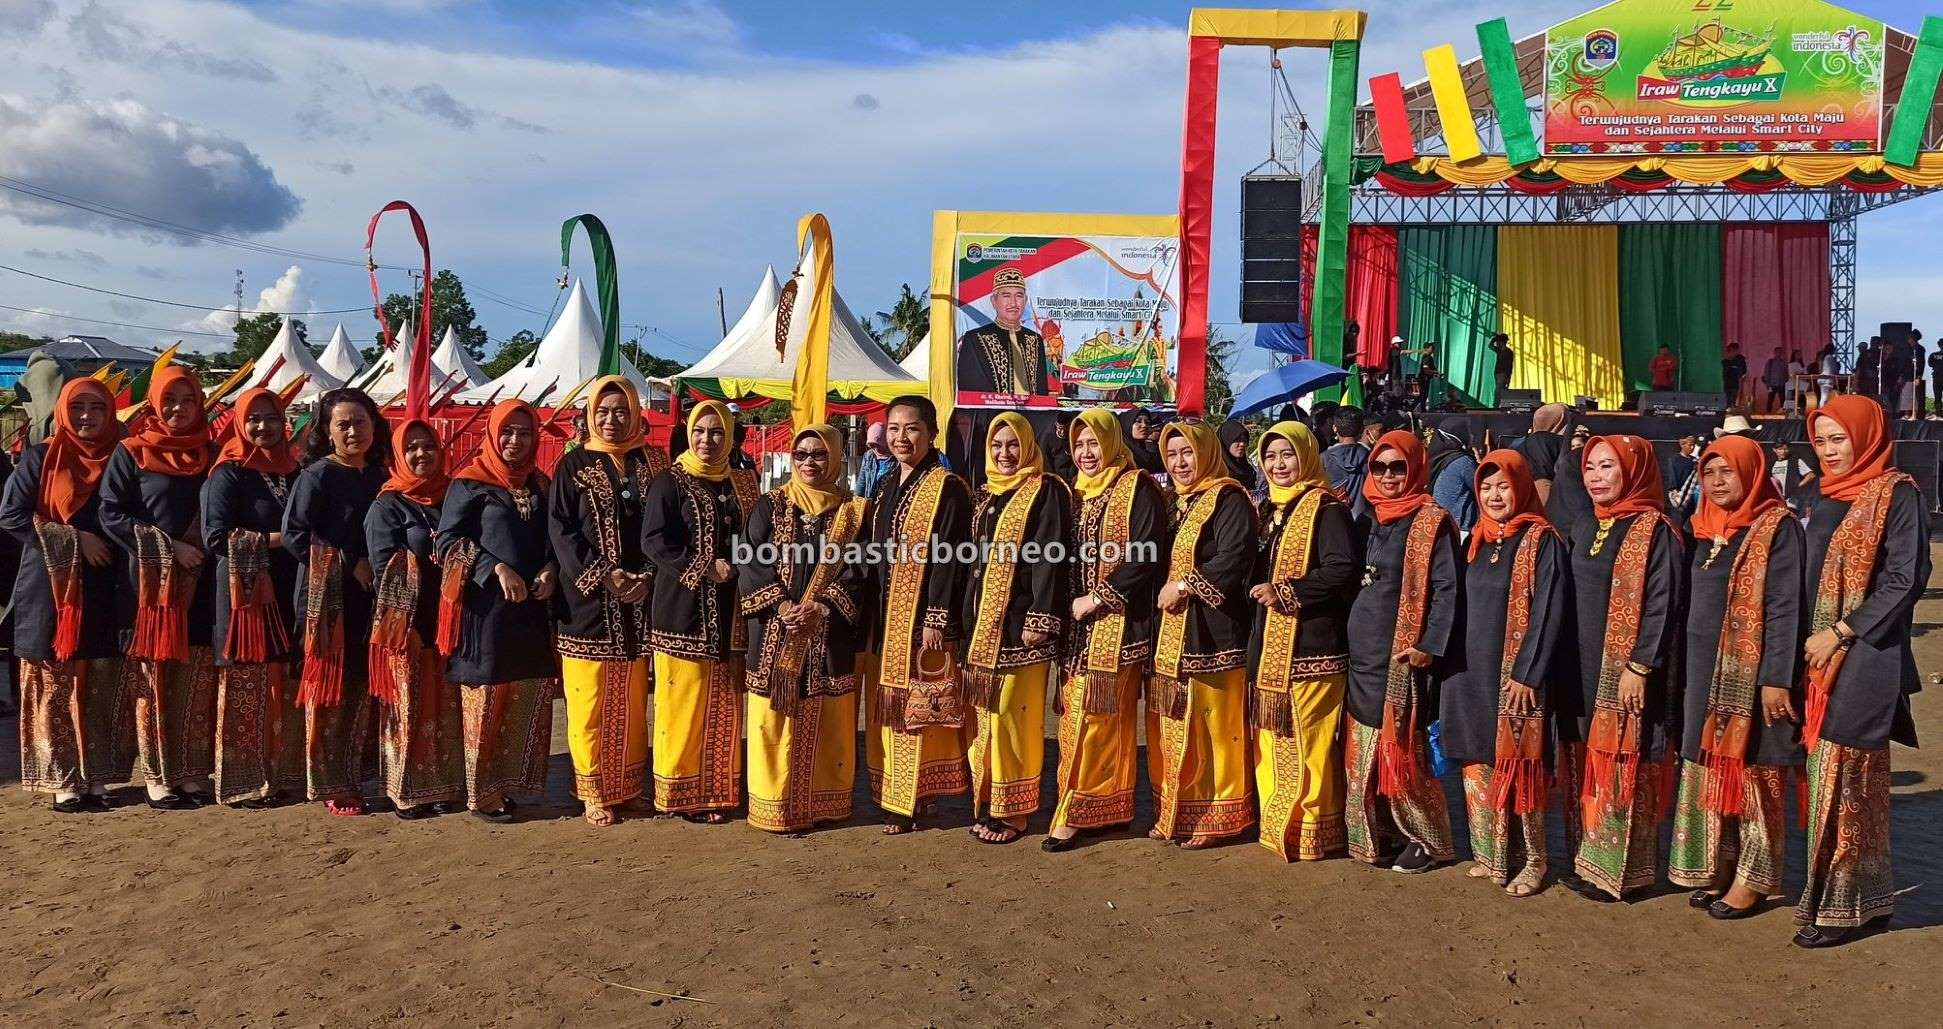 Festival Iraw Tengkayu, indigenous, destination, event, Ethnic, native, tribe, Indonesia, Pariwisata, Tourism, travel guide, Trans Borneo, 探索婆罗洲印尼, 北加里曼丹原住民, 打拉根达雅文化